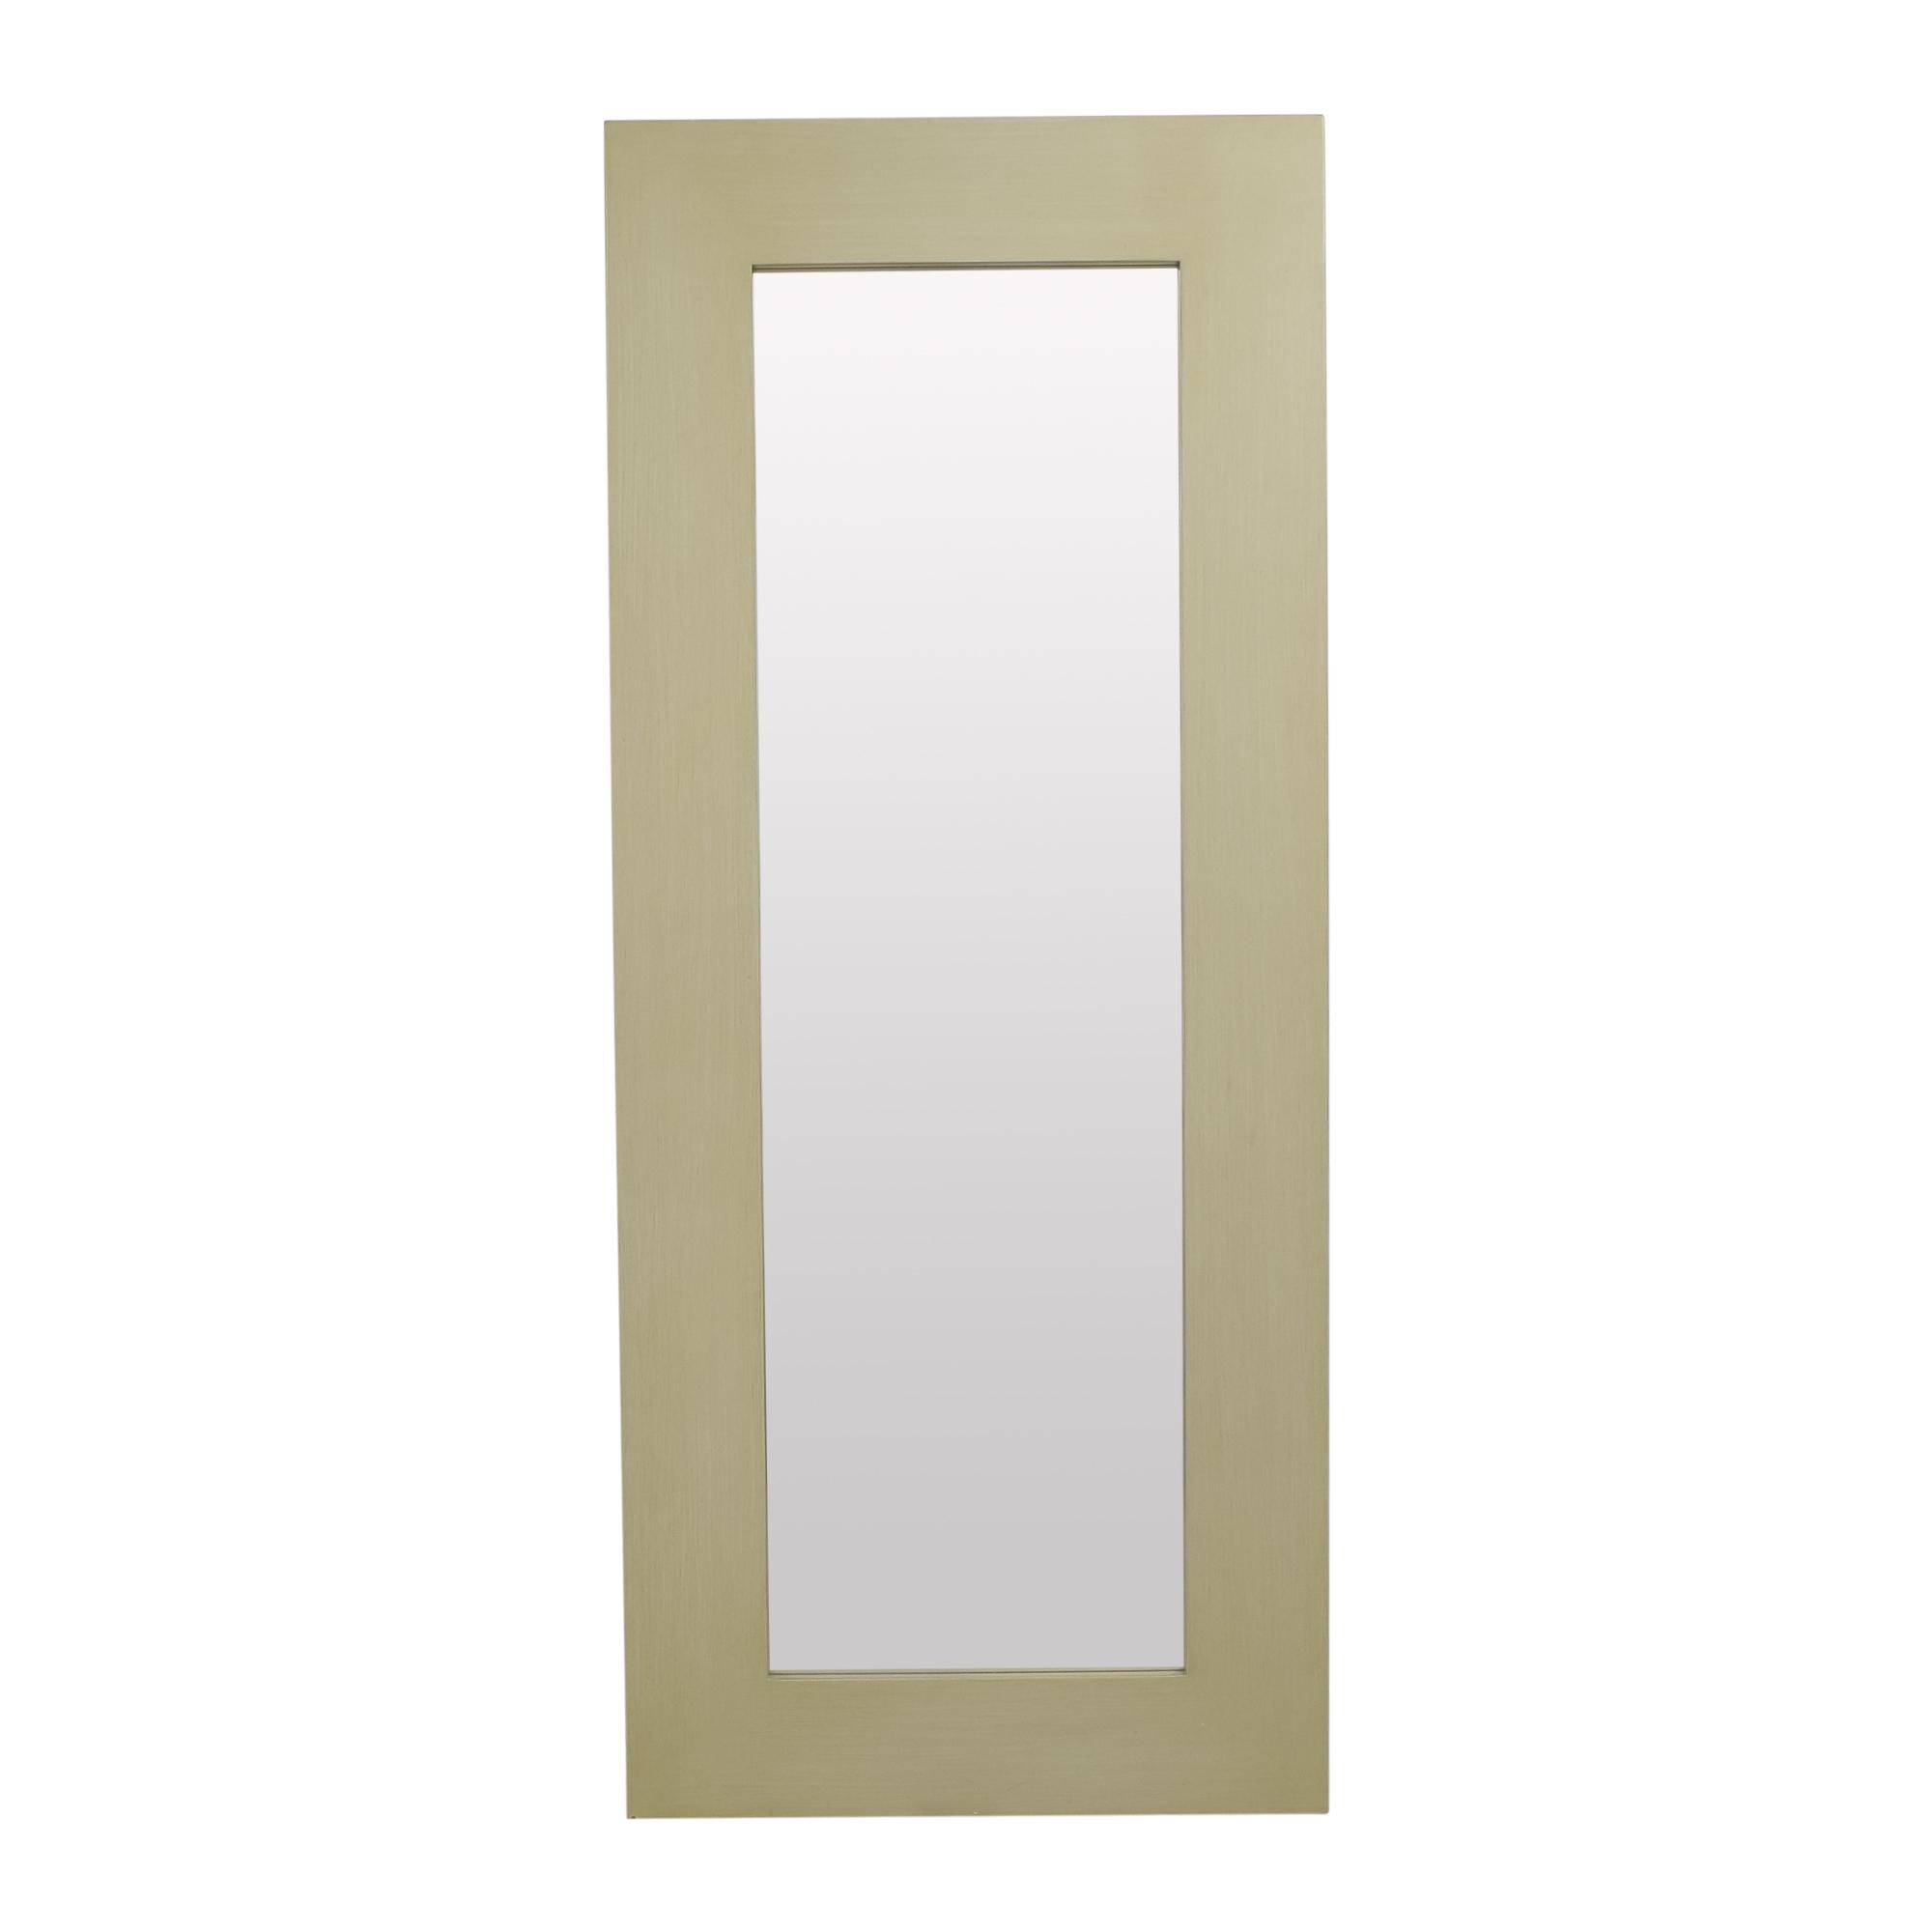 West Elm West Elm Chunky Floor Mirror coupon